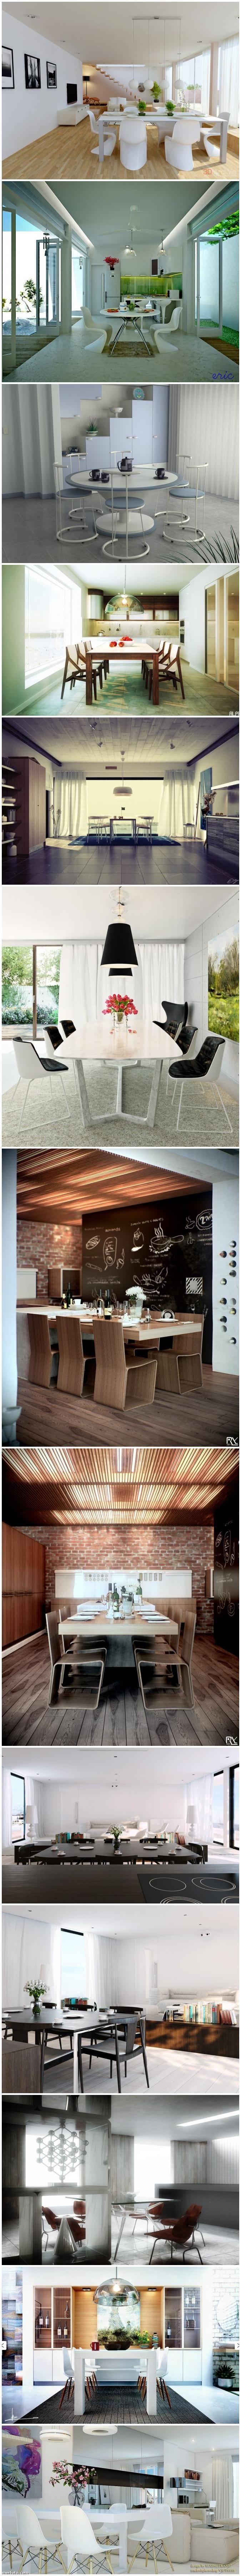 best italian dining room images on pinterest